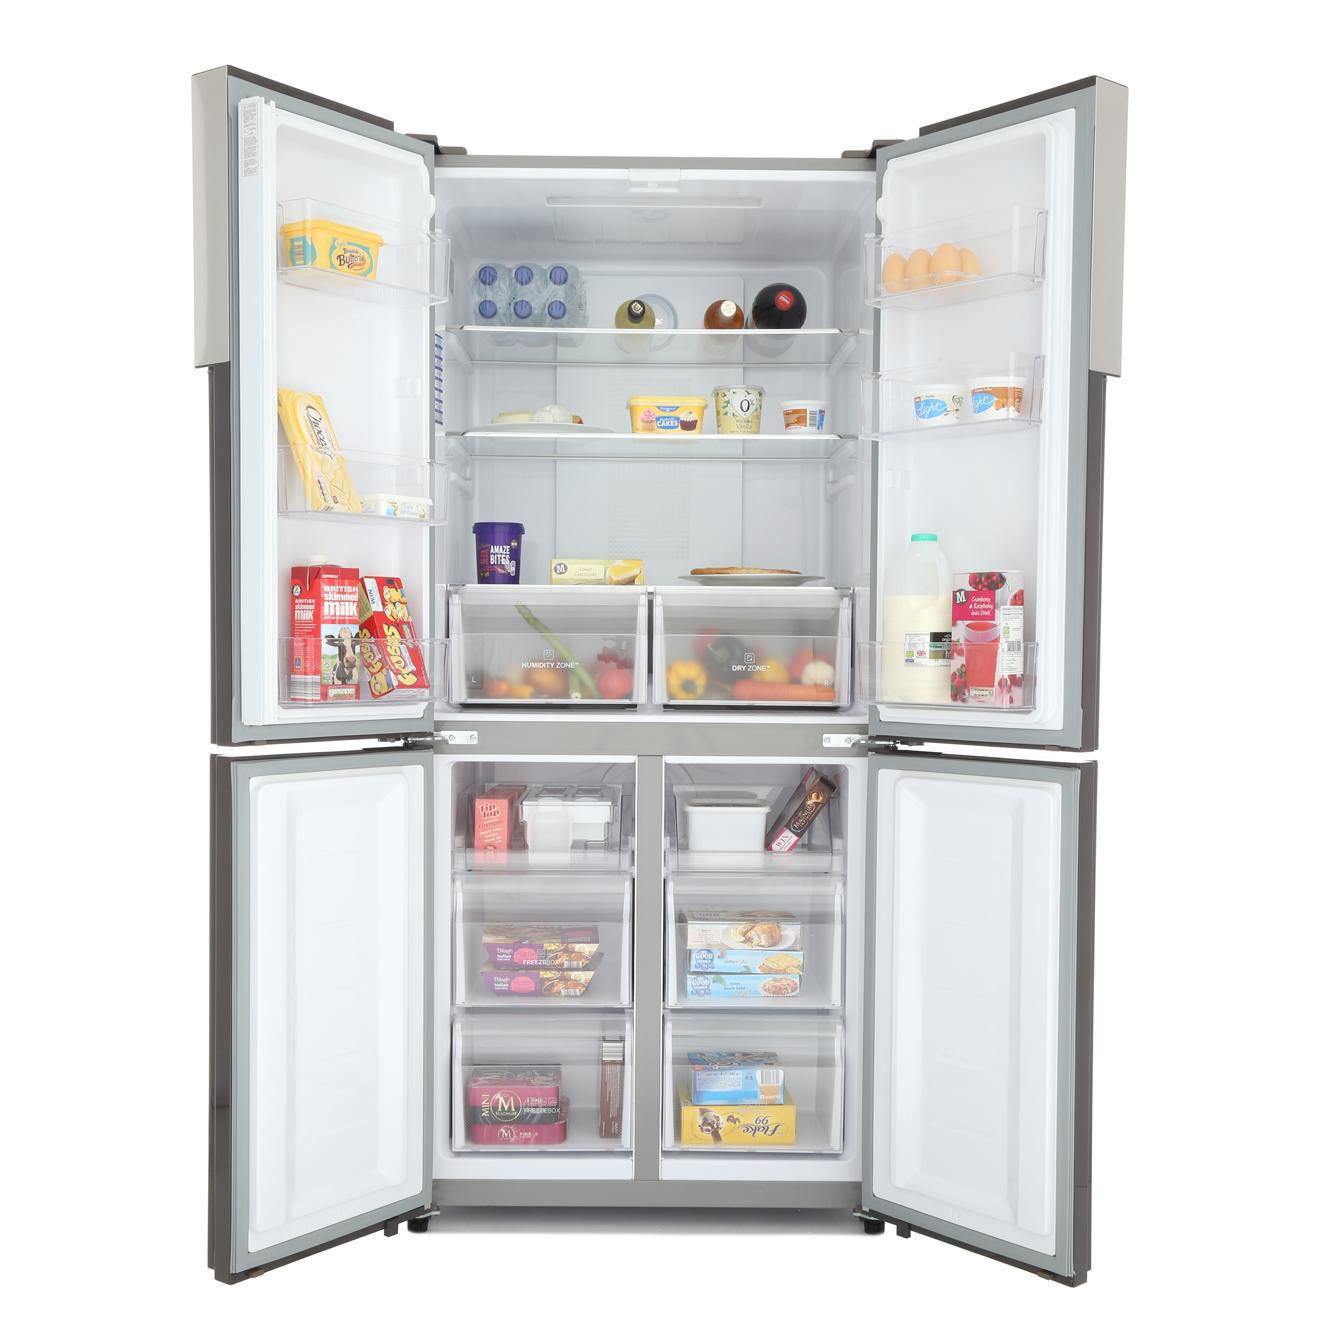 buy haier htf 456dm6 american fridge freezer stainless steel marks electrical. Black Bedroom Furniture Sets. Home Design Ideas